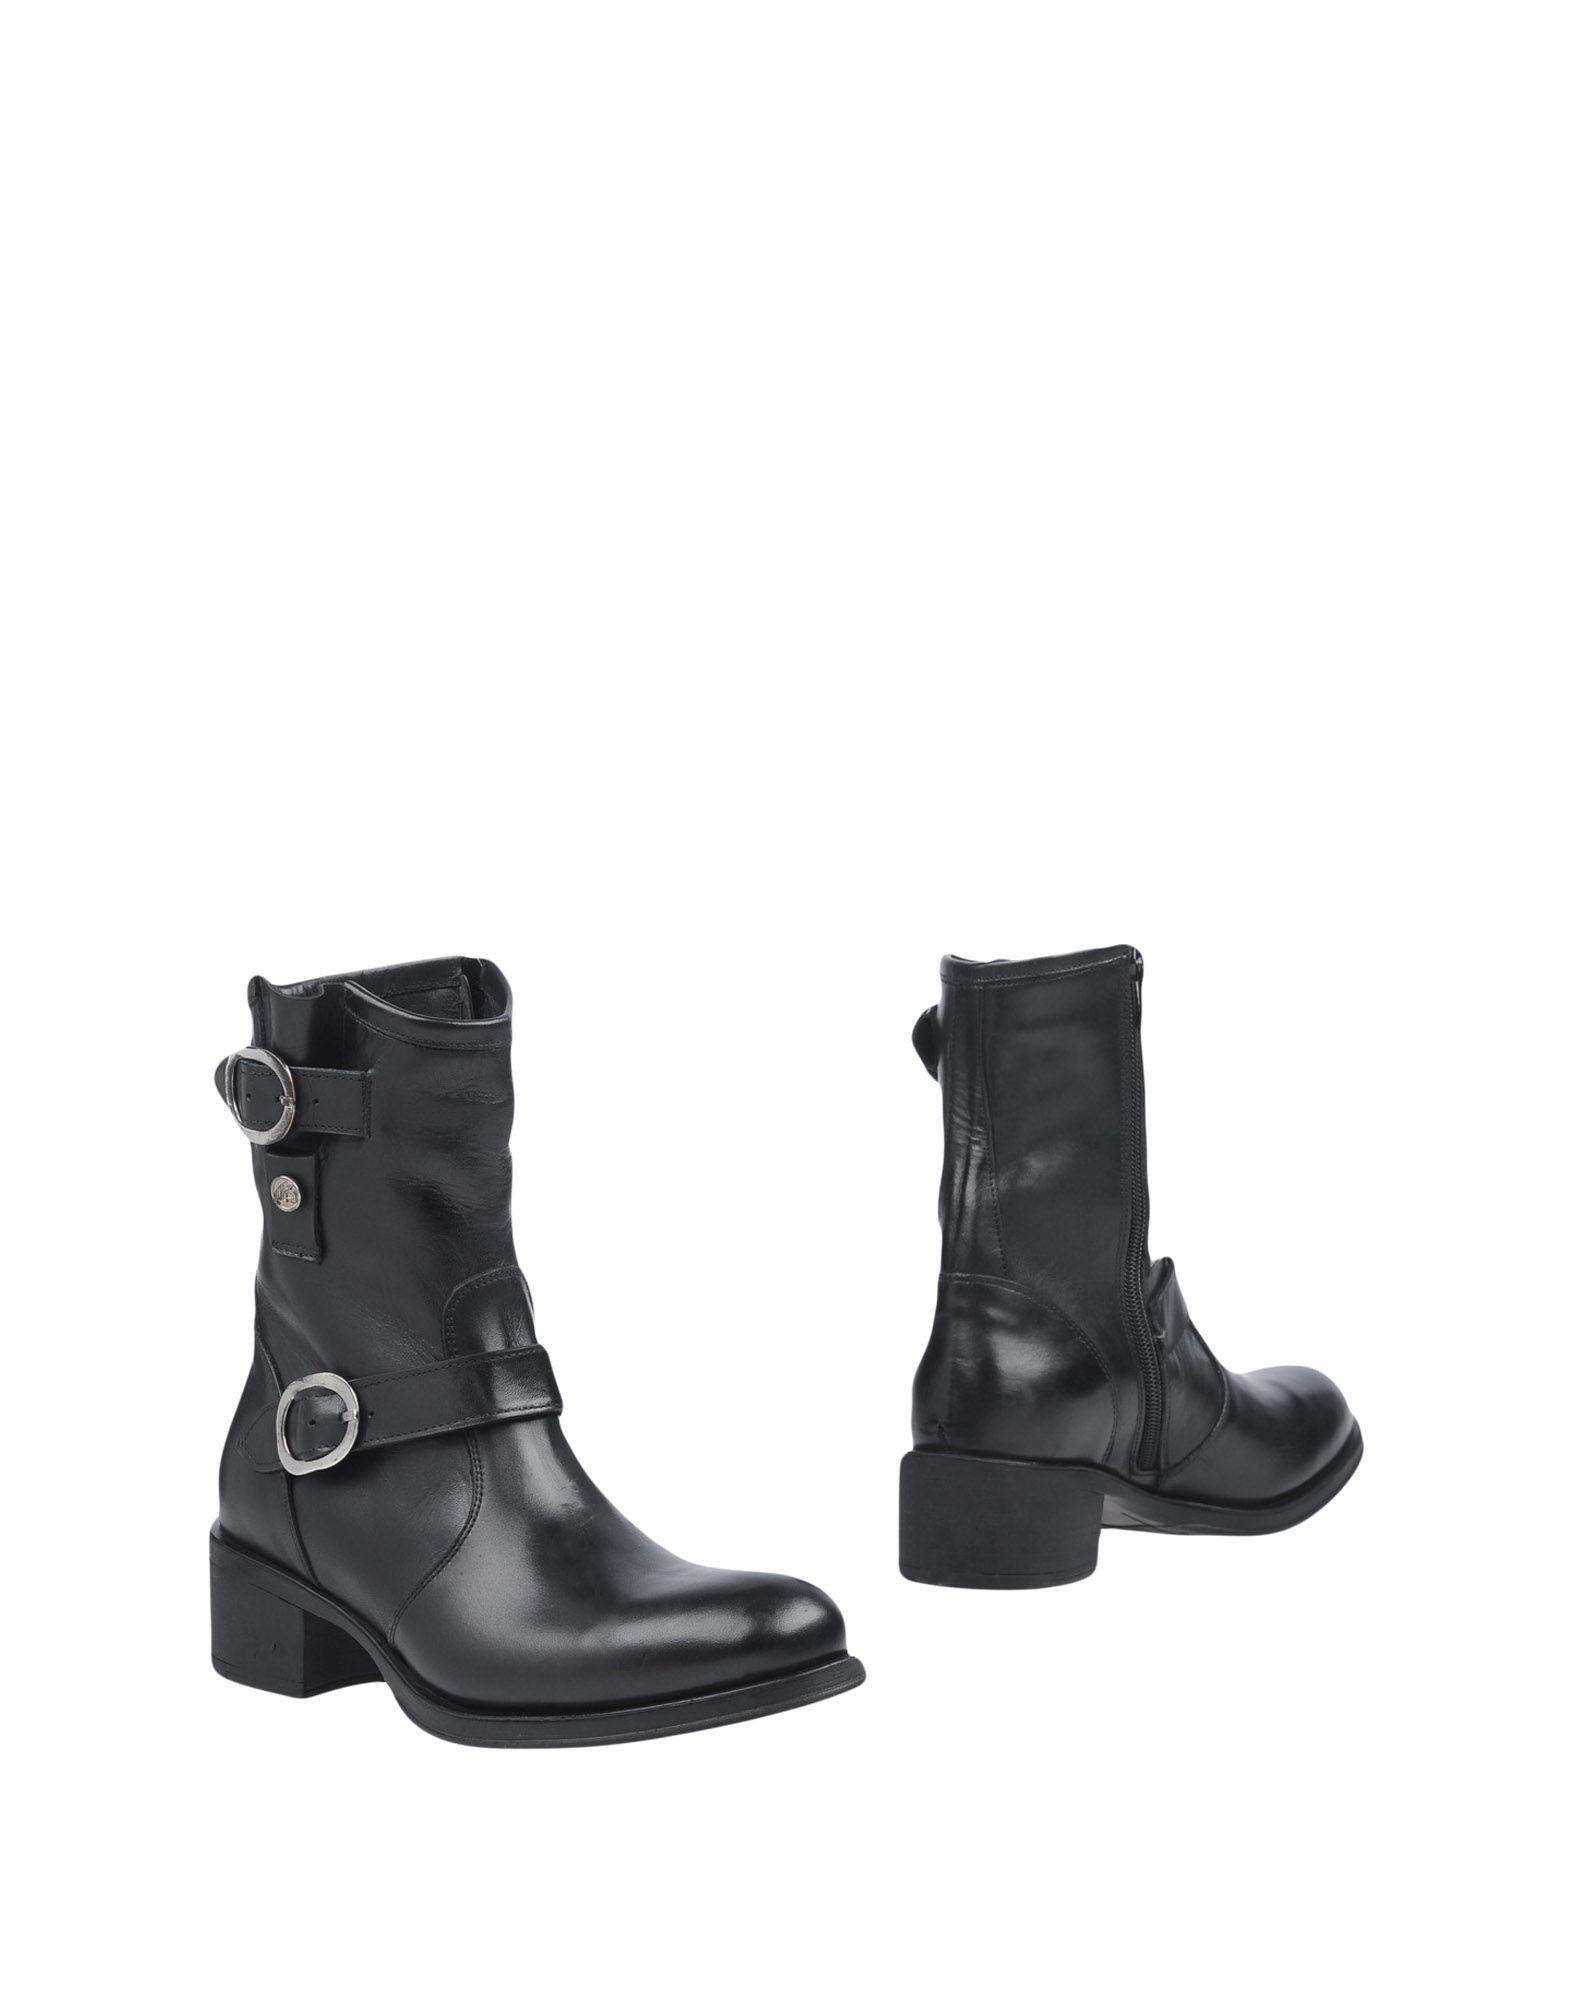 Stilvolle billige Schuhe John Galliano Stiefelette Damen  11351843RI